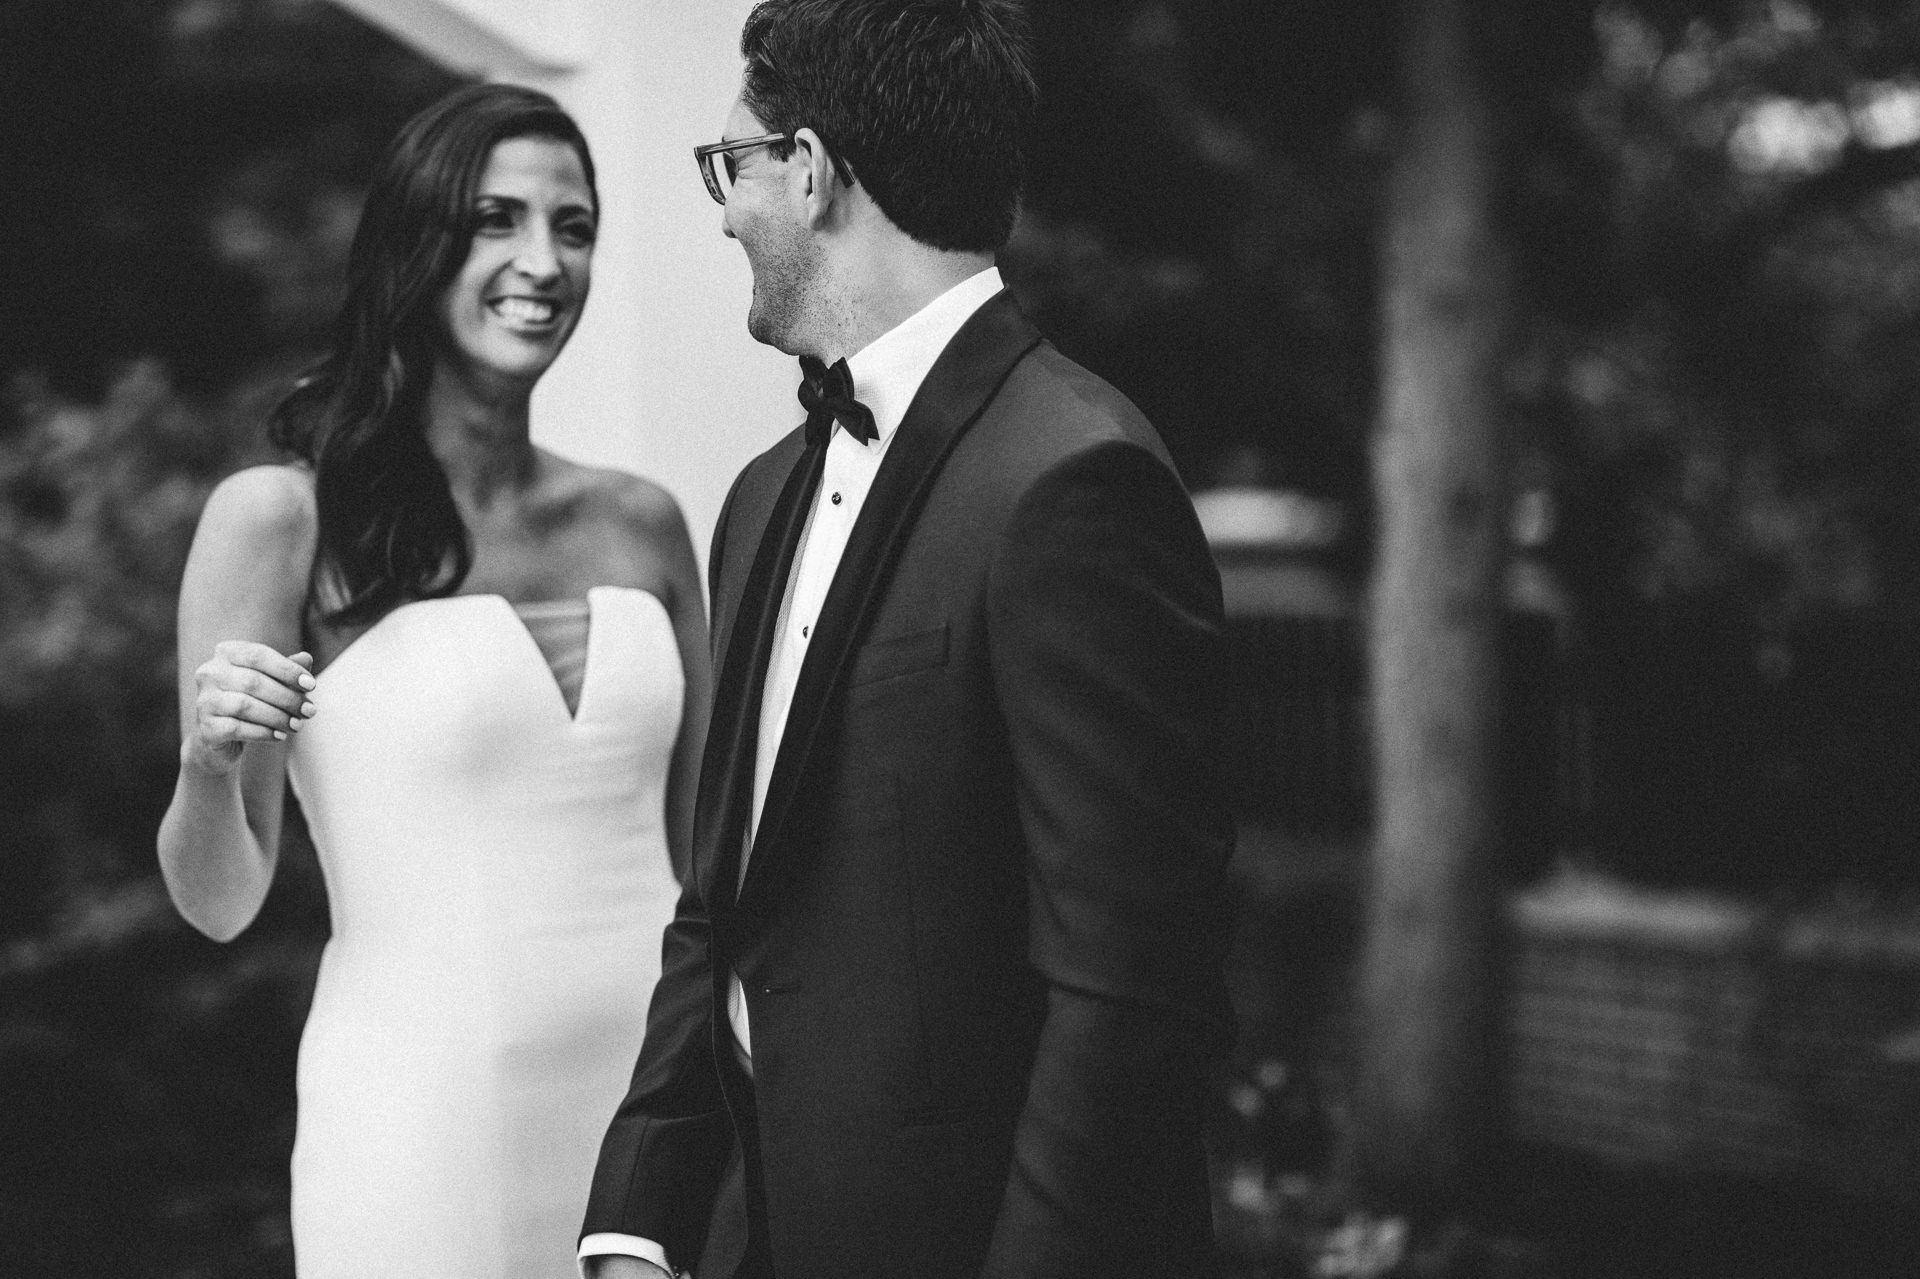 Beechmont Country Club Wedding Photographer in Beachwood 1 24.jpg